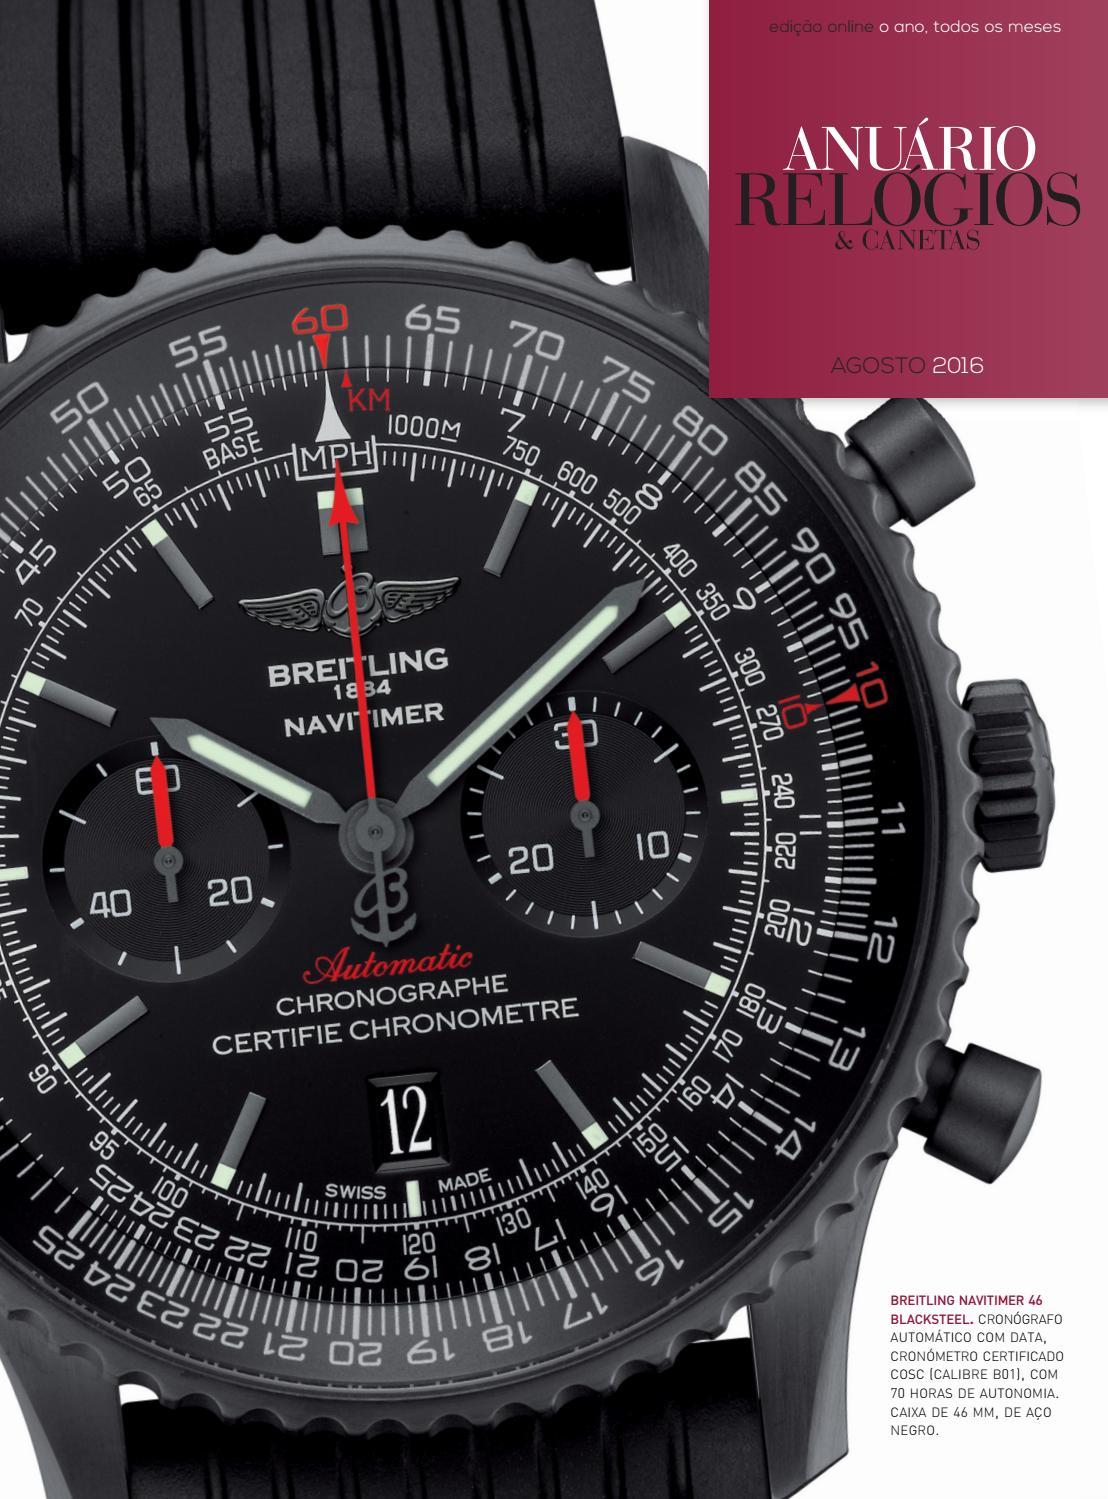 3aaa568fa67 Anuário Relógios   Canetas - Agosto 2016 by Anuário Relógios   Canetas -  issuu